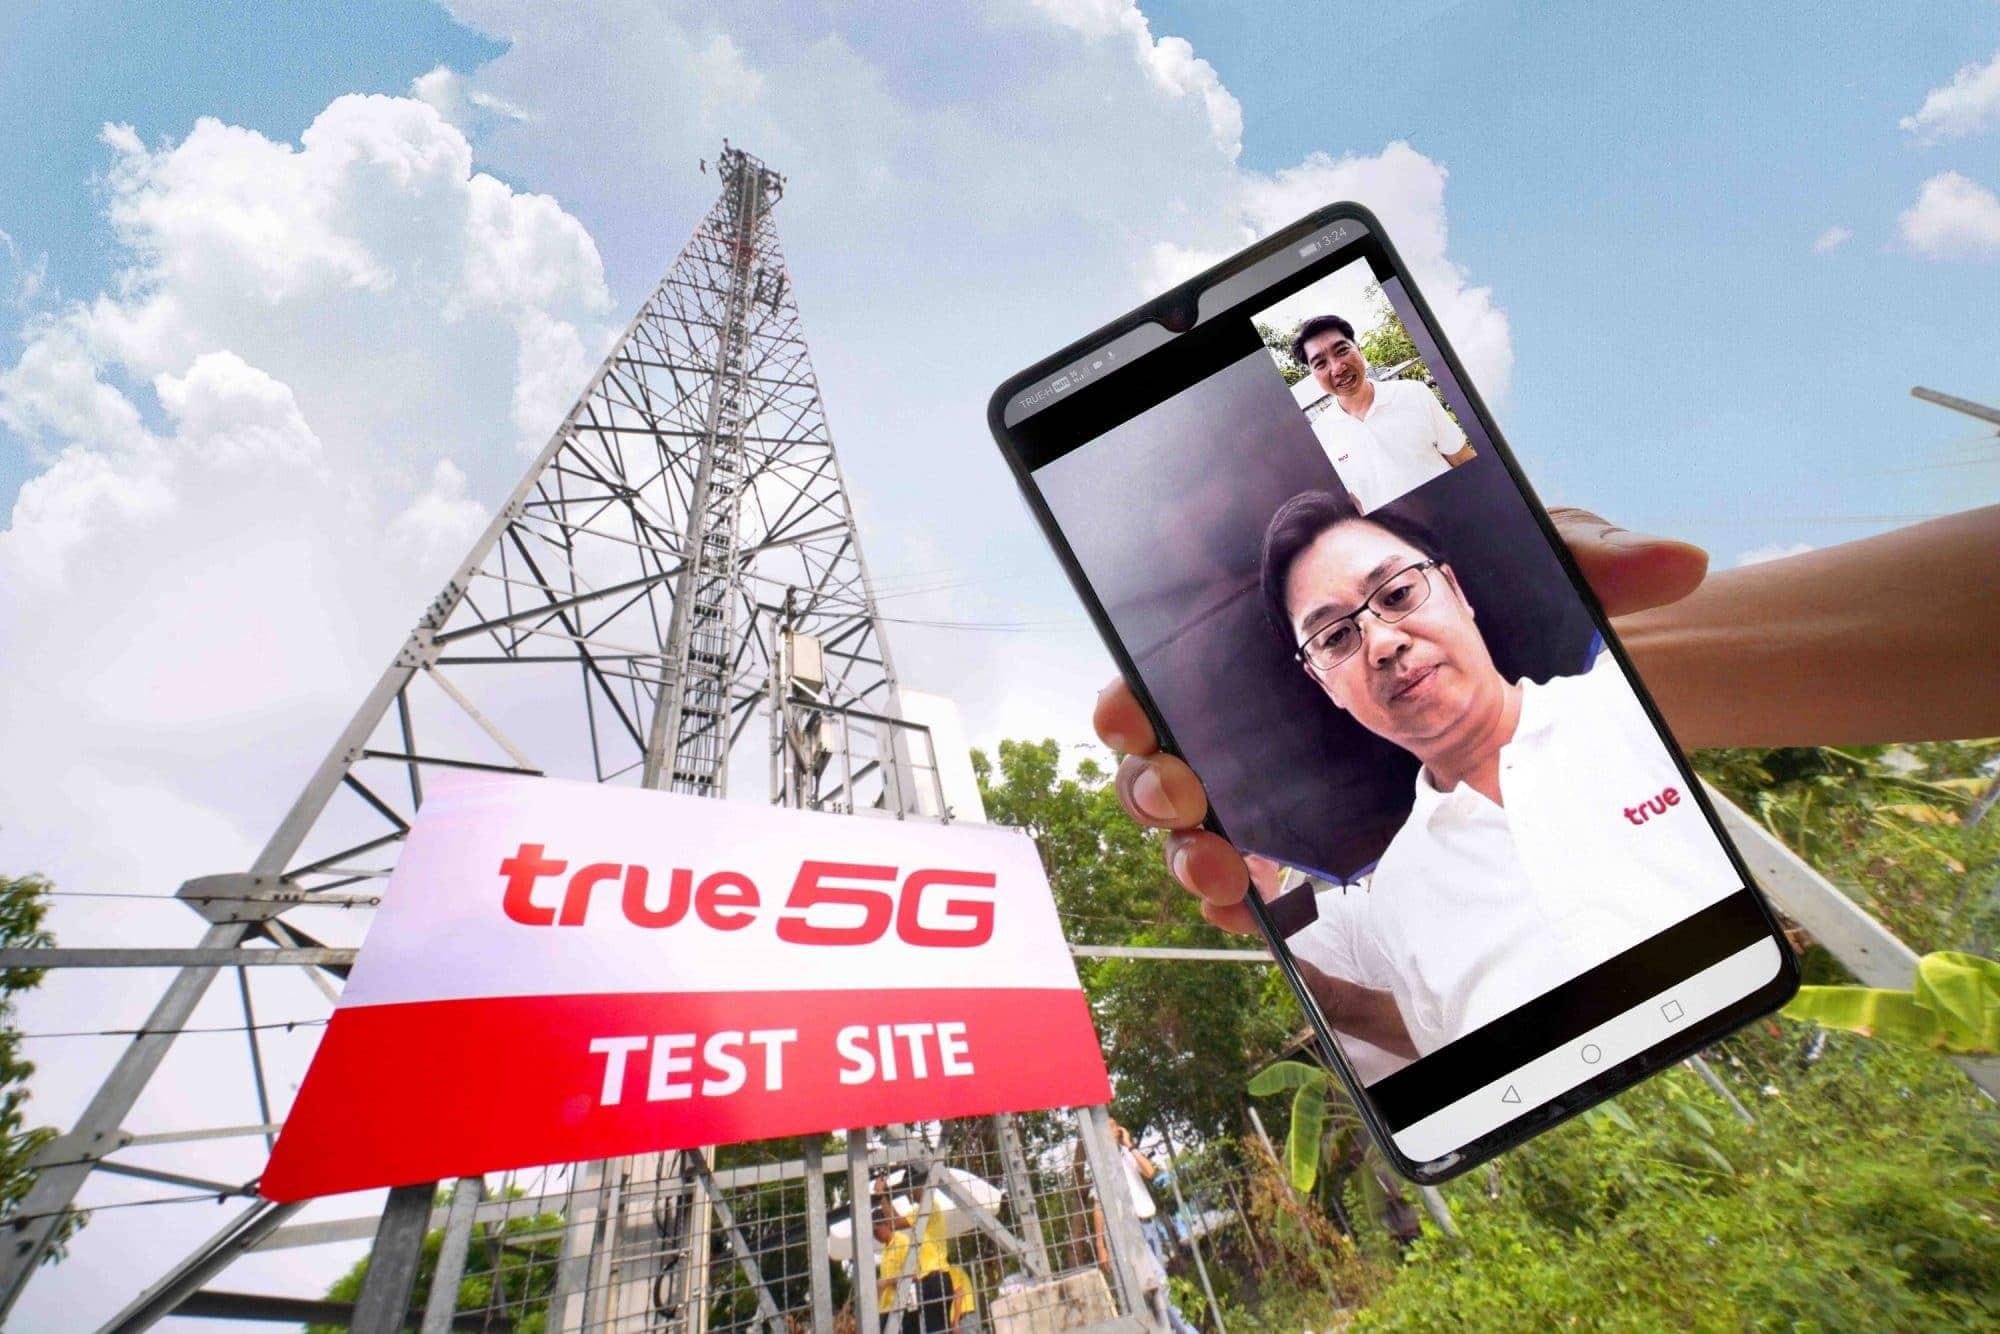 - Truemove H ทดสอบ 5G Video call 4K บน HUAWEI Mate 20X 5G ครั้งแรกในไทย